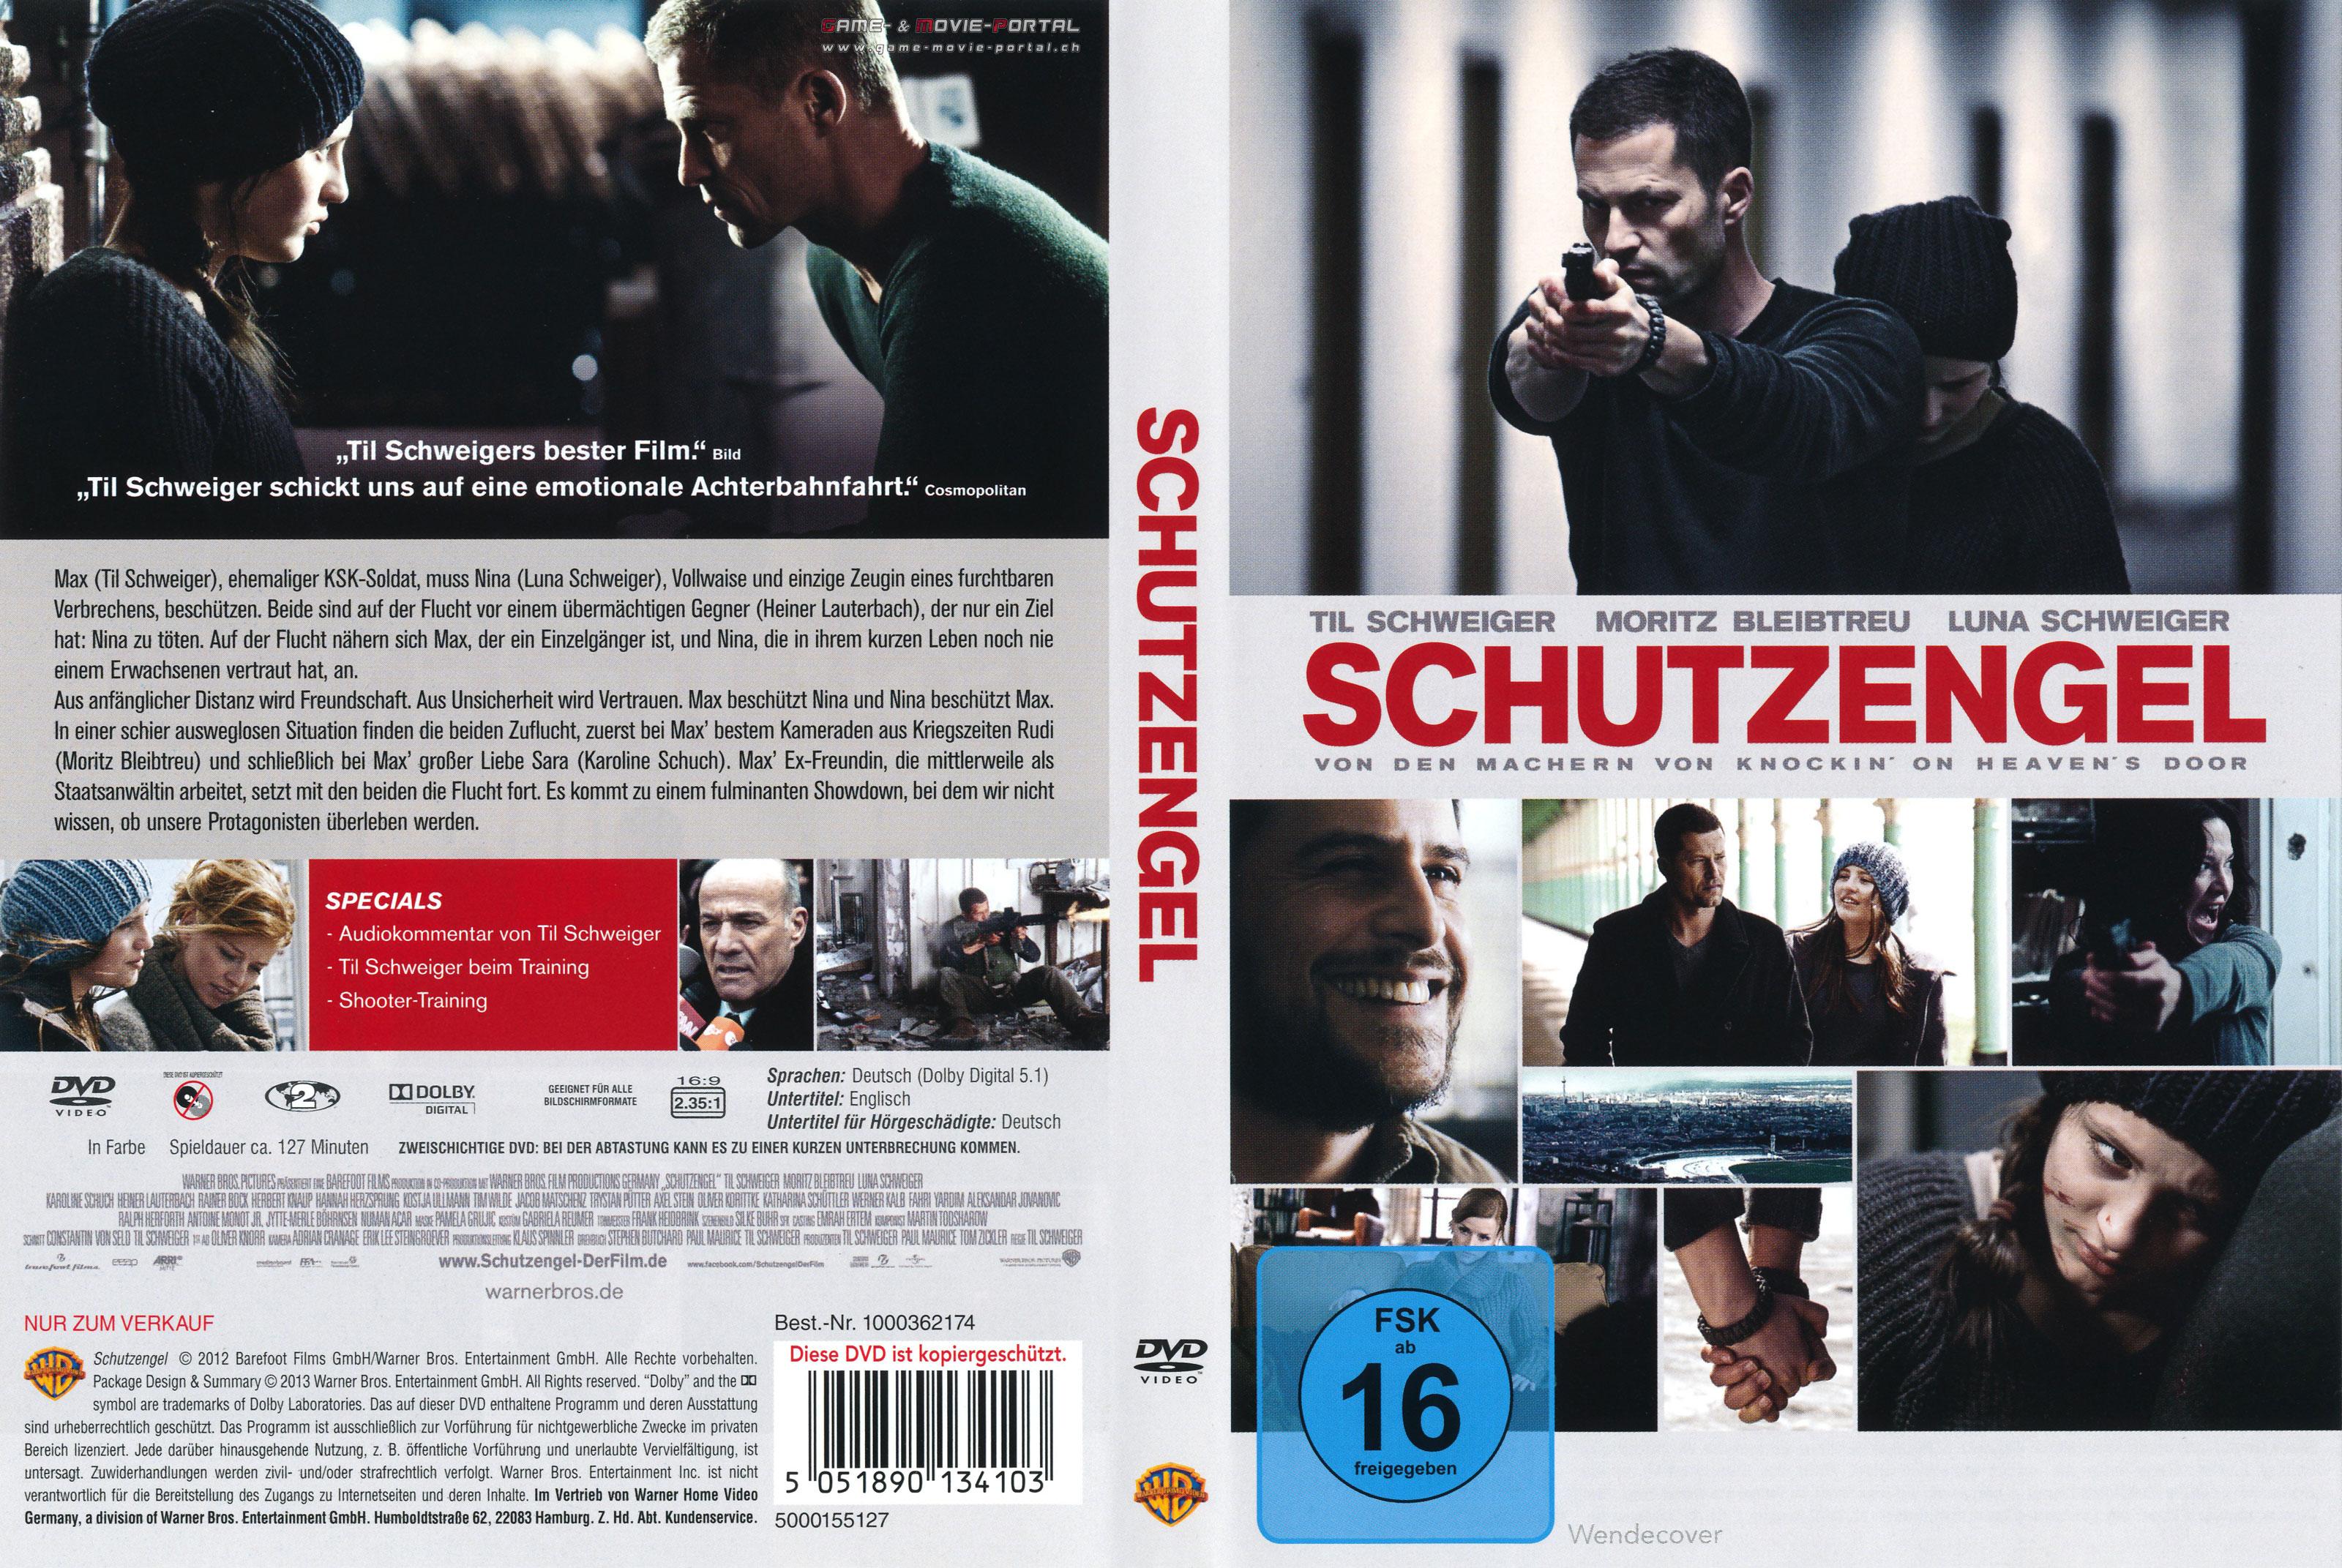 deutsche covers in german video dvd covers auf deutsch. Black Bedroom Furniture Sets. Home Design Ideas